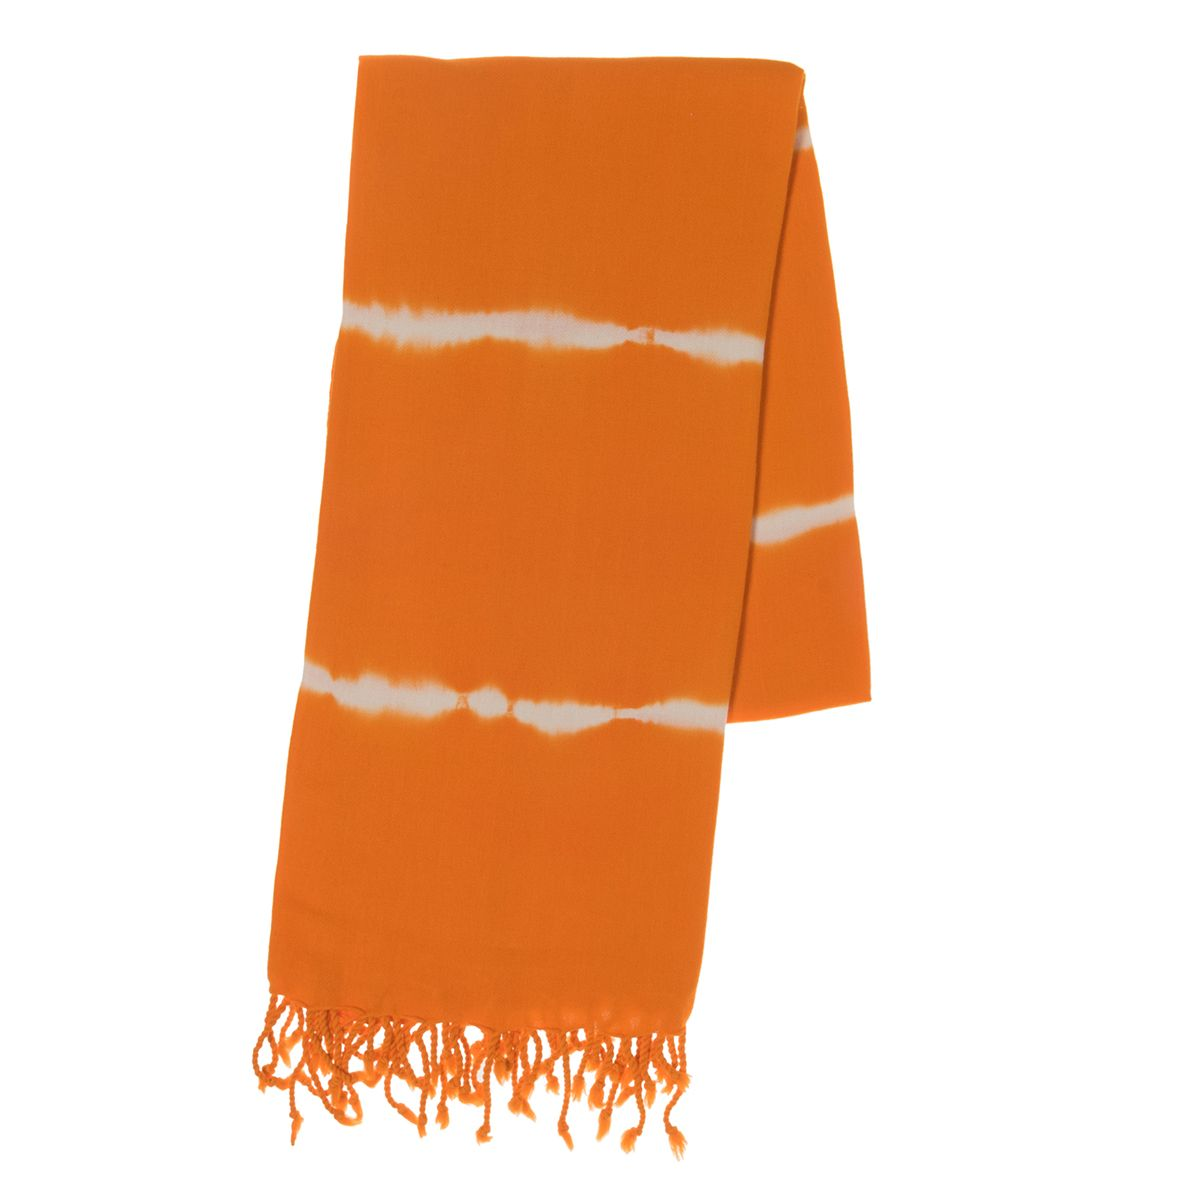 Peshtemal - Tie-Dye / Base Orange